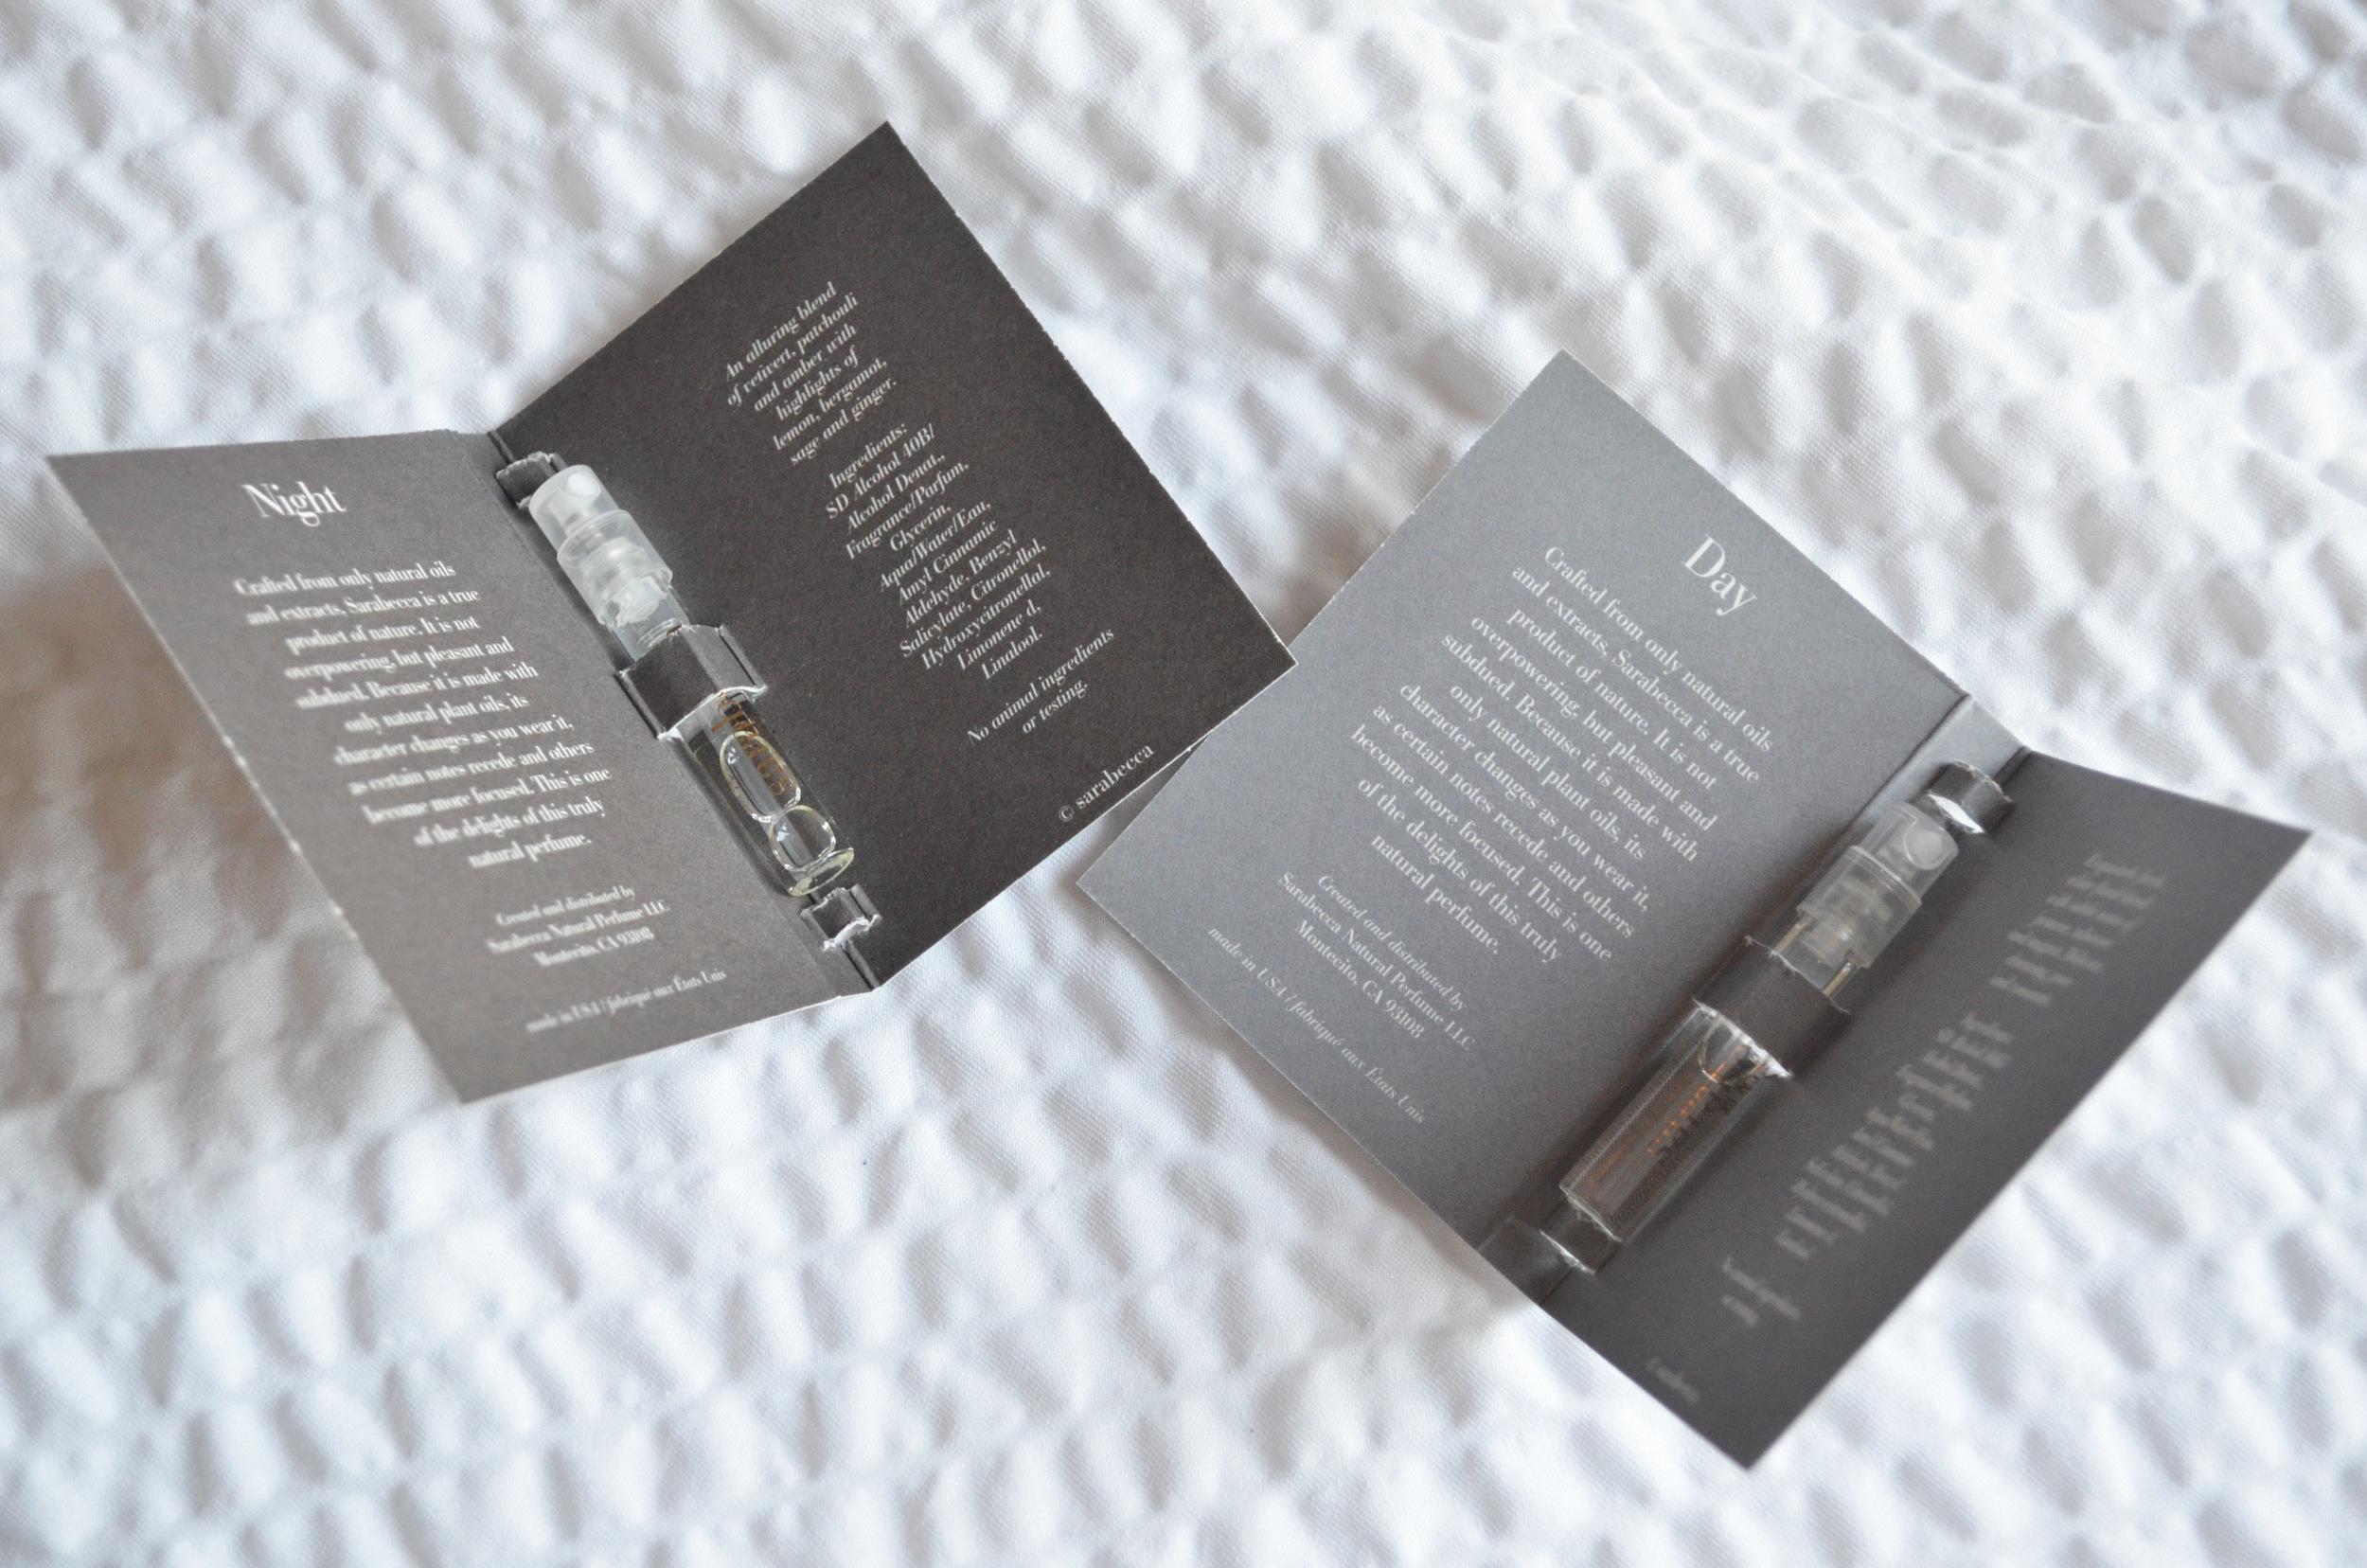 sarabecca review, sarabecca day perfume review, sarabecca night perfume review